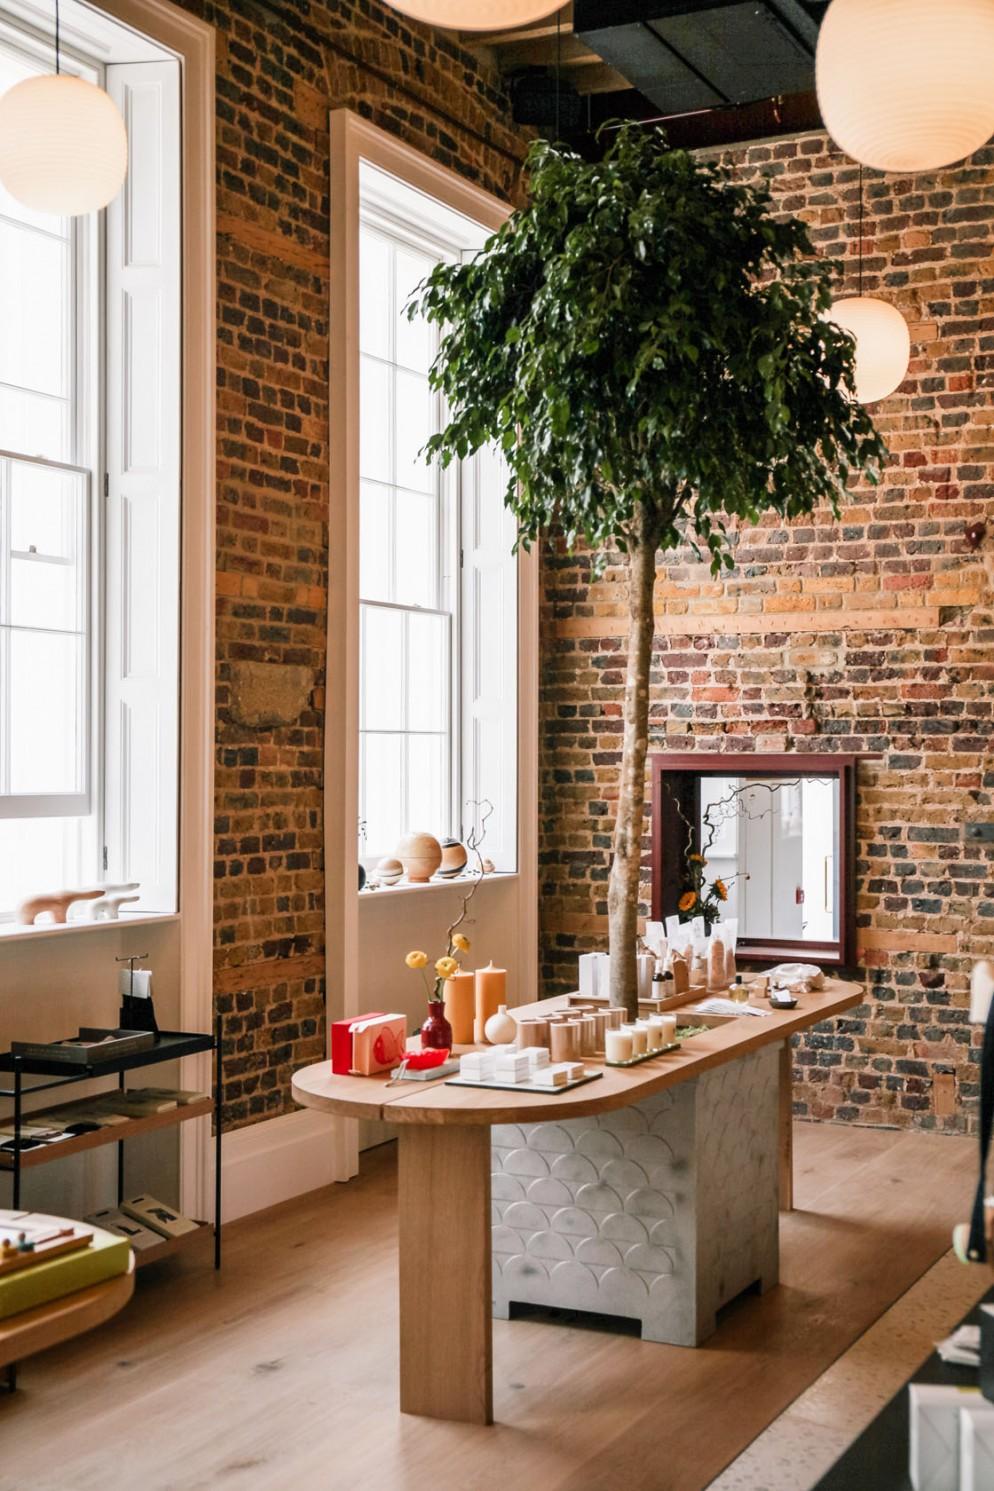 Pantechnicon-store-restaurant-londra-london-12